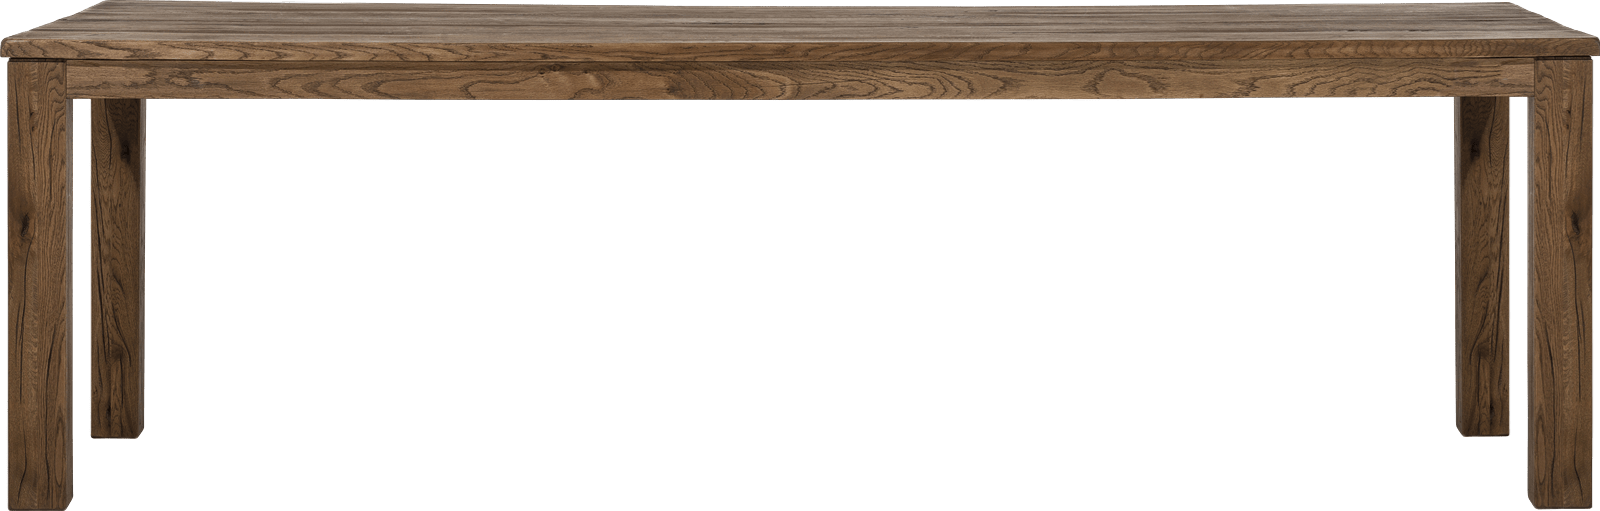 Masters - eetkamertafel 260 x 100 cm - hout 9x9